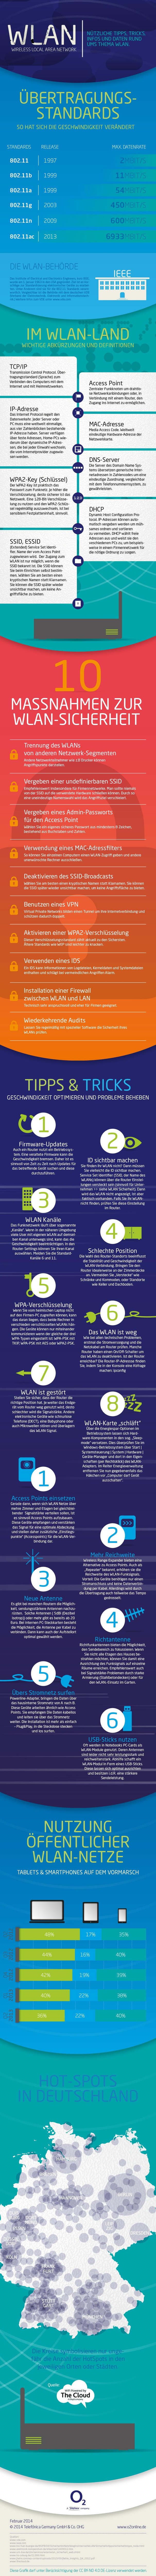 Infografik: O2 WLAN